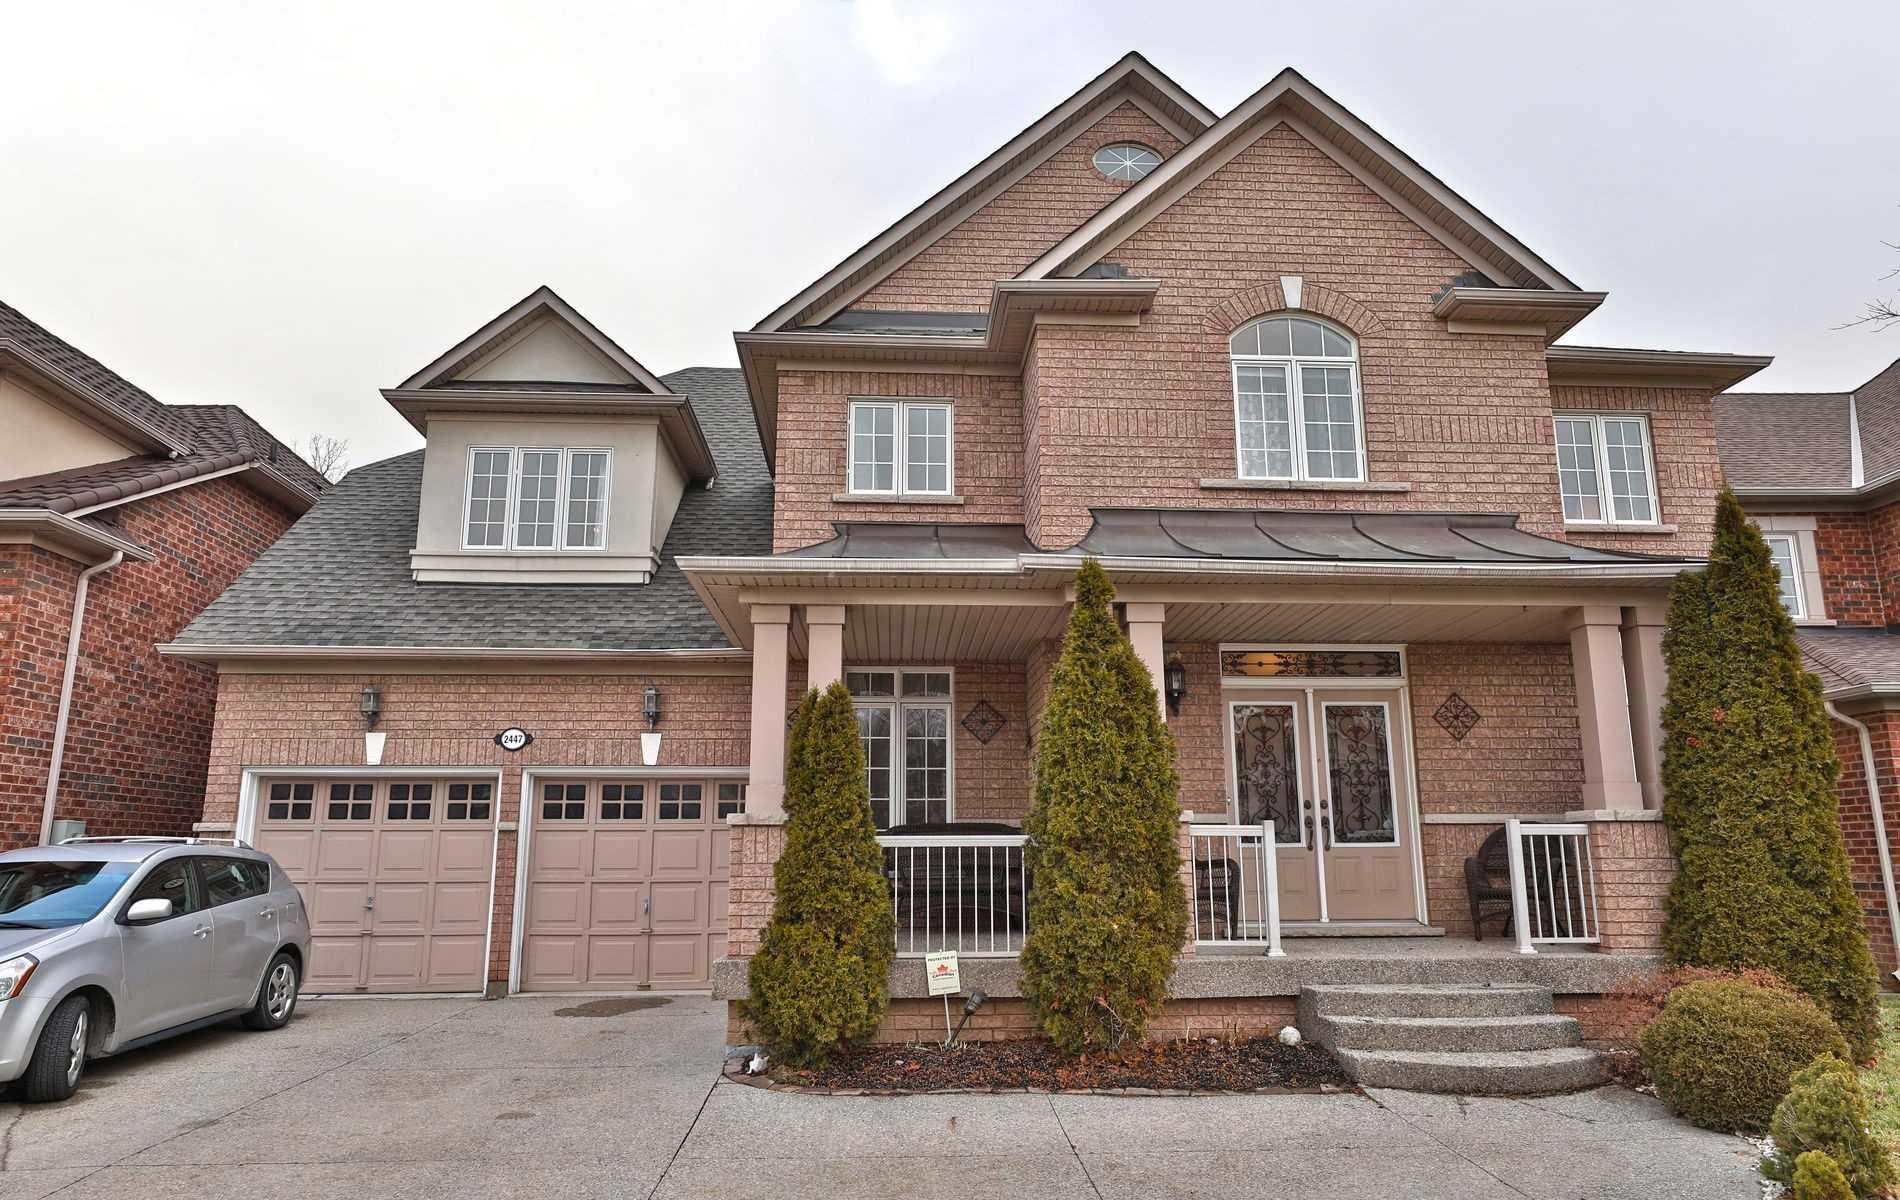 For Sale: 2447 Whitehorn Drive, Burlington, ON | 4 Bed, 5 Bath House for $1425000.00.